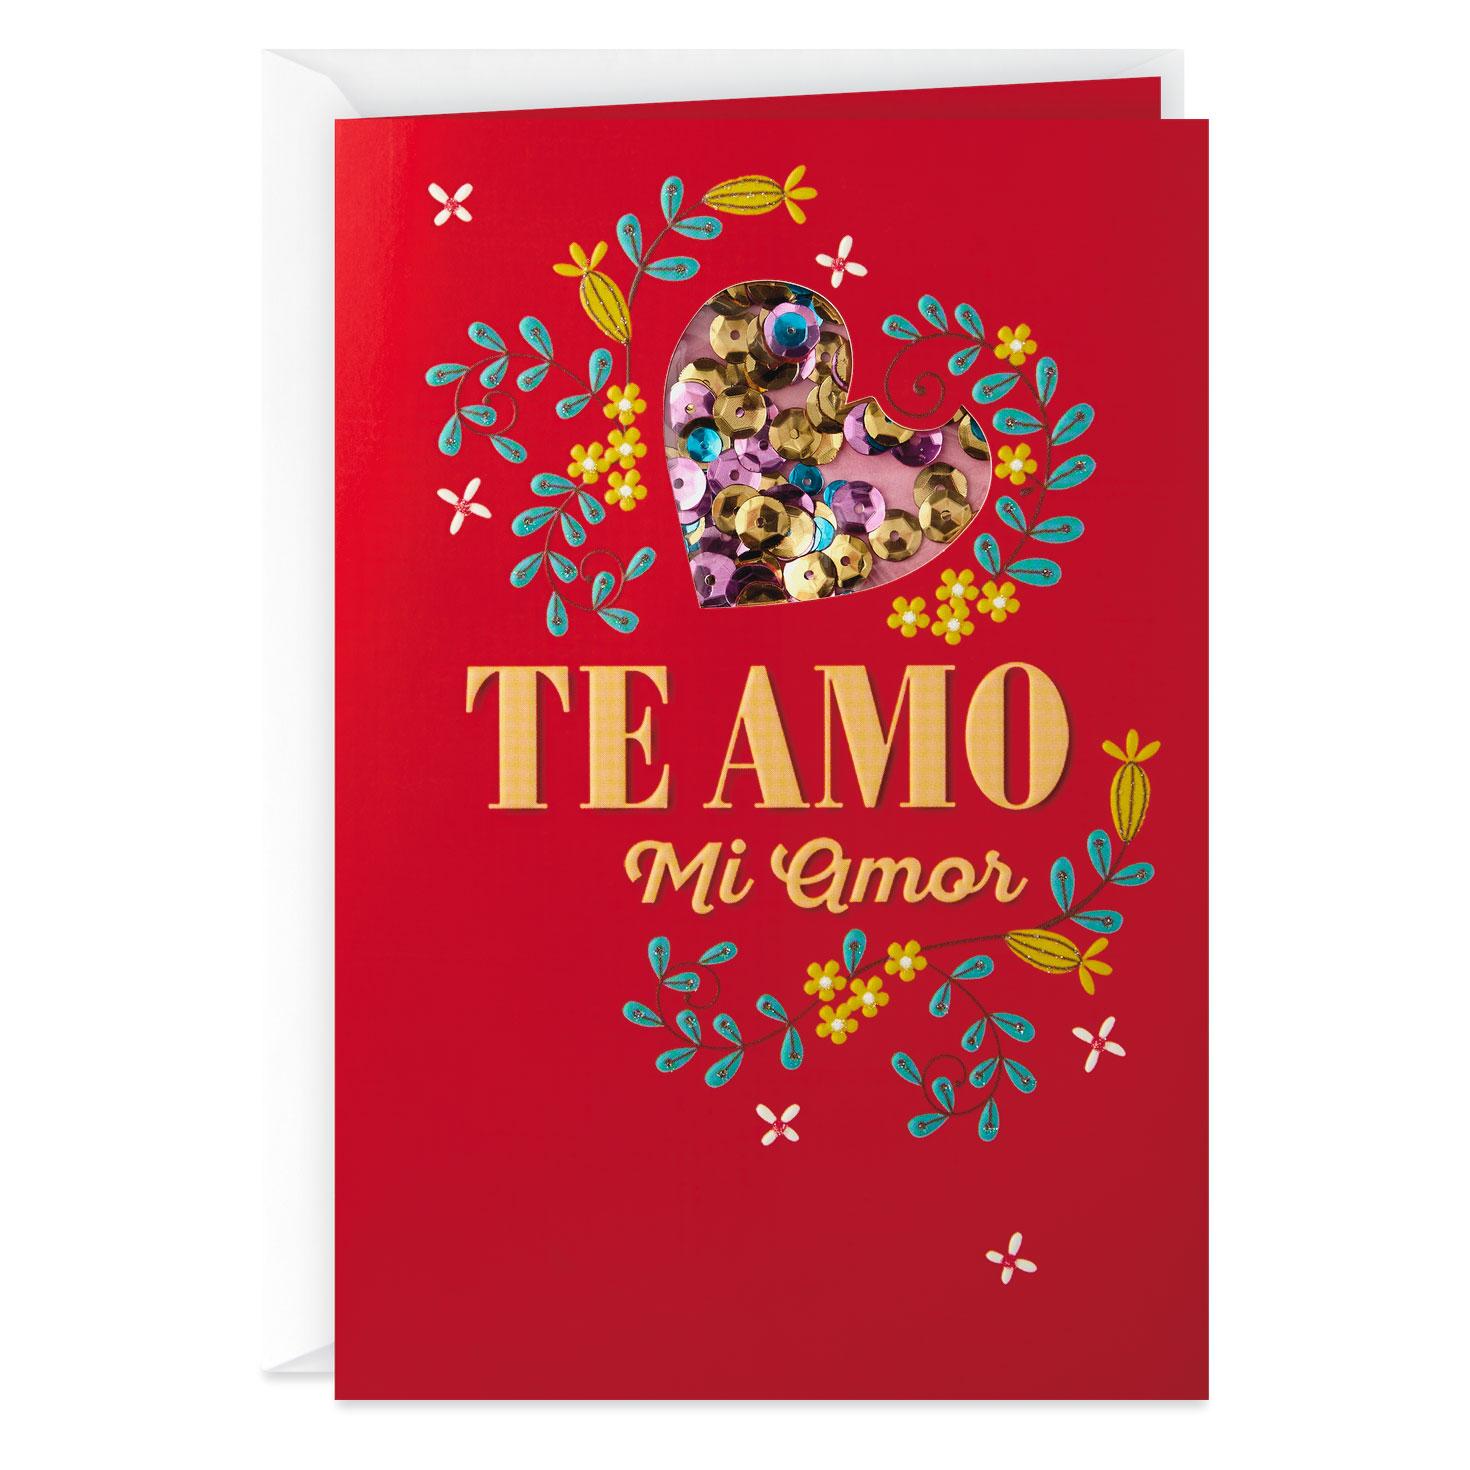 photograph about Spanish Birthday Cards Printable called Te Amo, Mi Amor Spanish-Language Take pleasure in Card